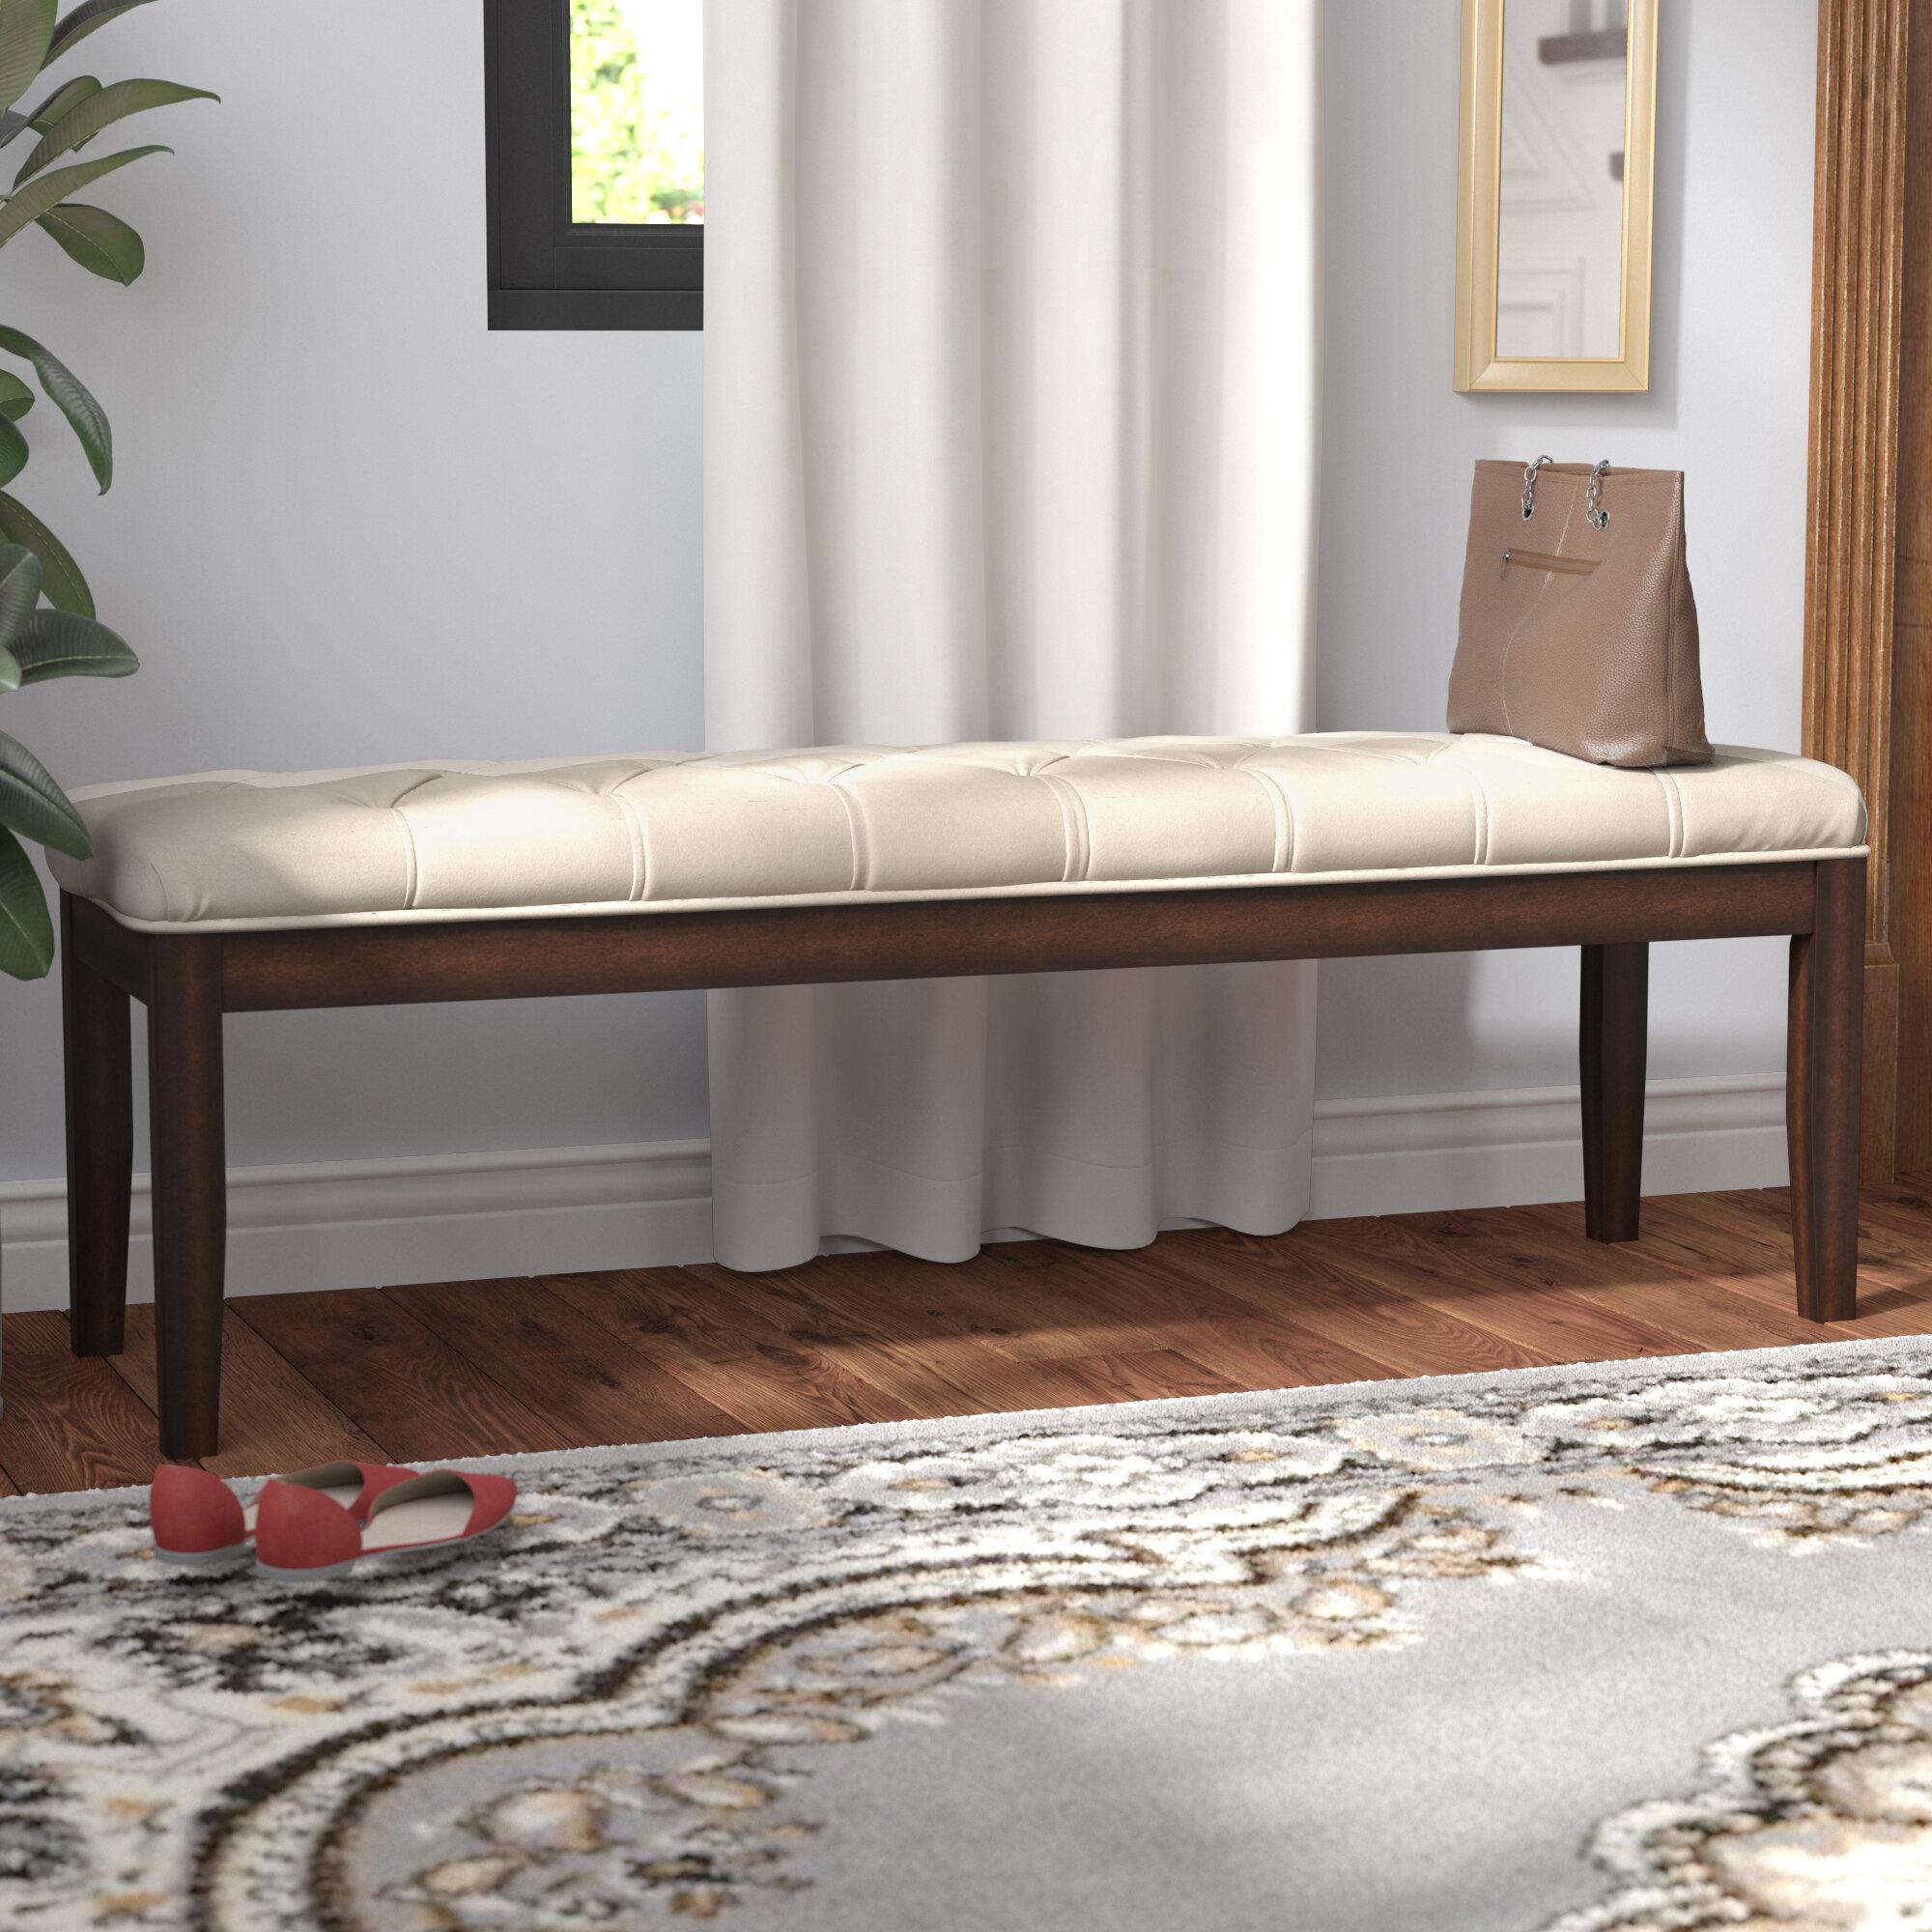 Wondrous Neumann Upholstered Bench Creativecarmelina Interior Chair Design Creativecarmelinacom